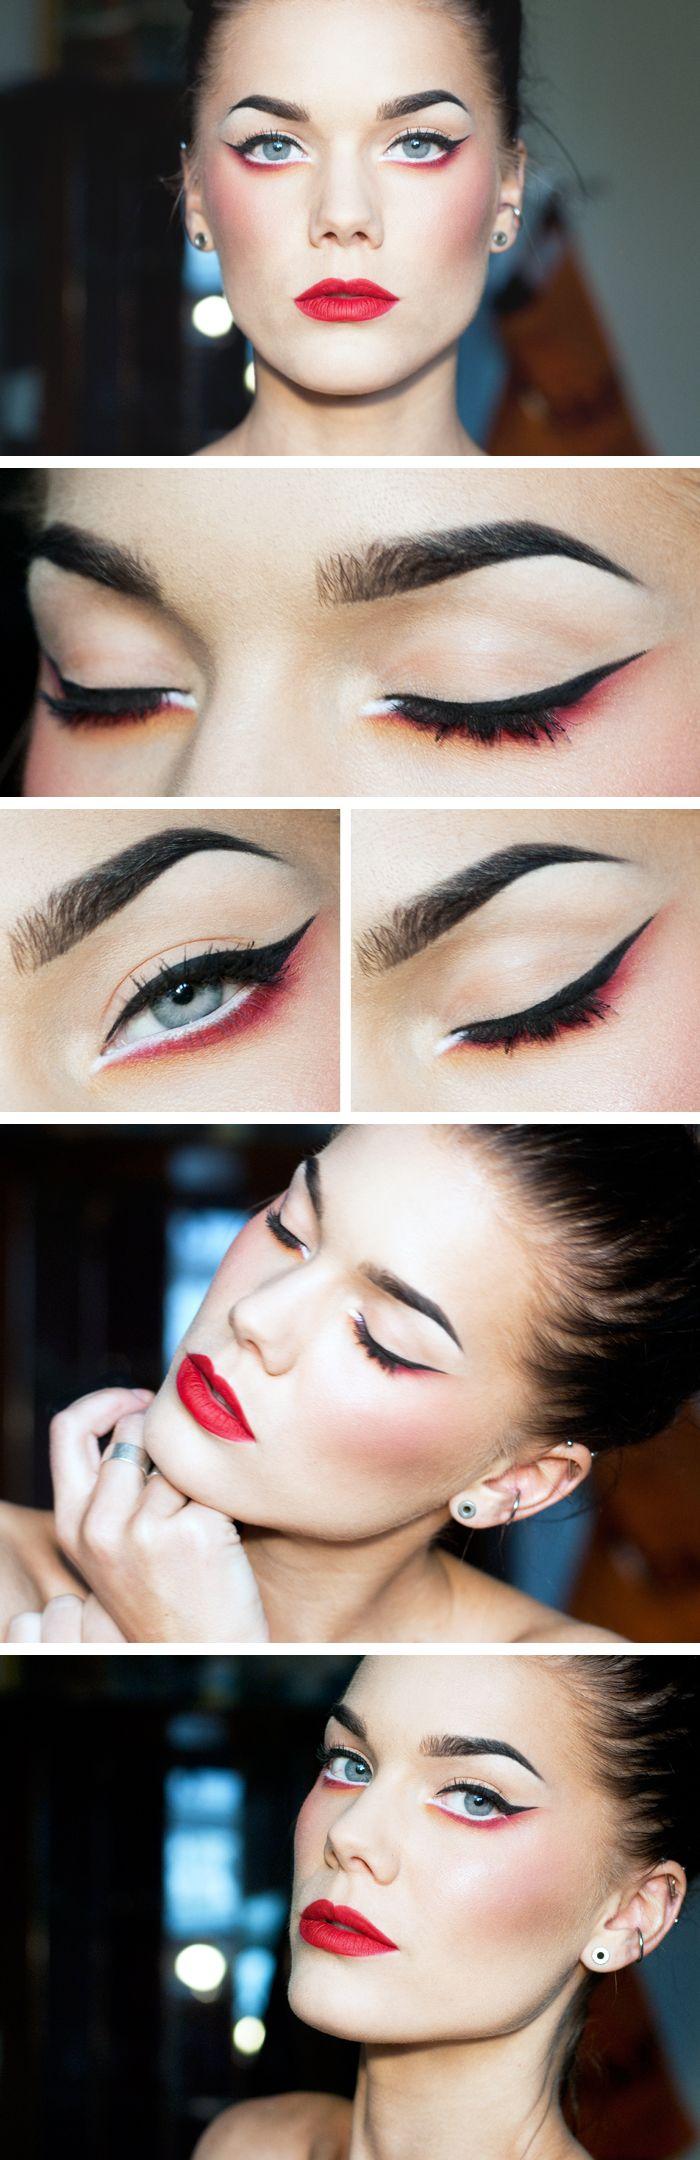 "Today's Look: :The Modern Geisha"" -Linda Hallberg (red!)04/07/13"